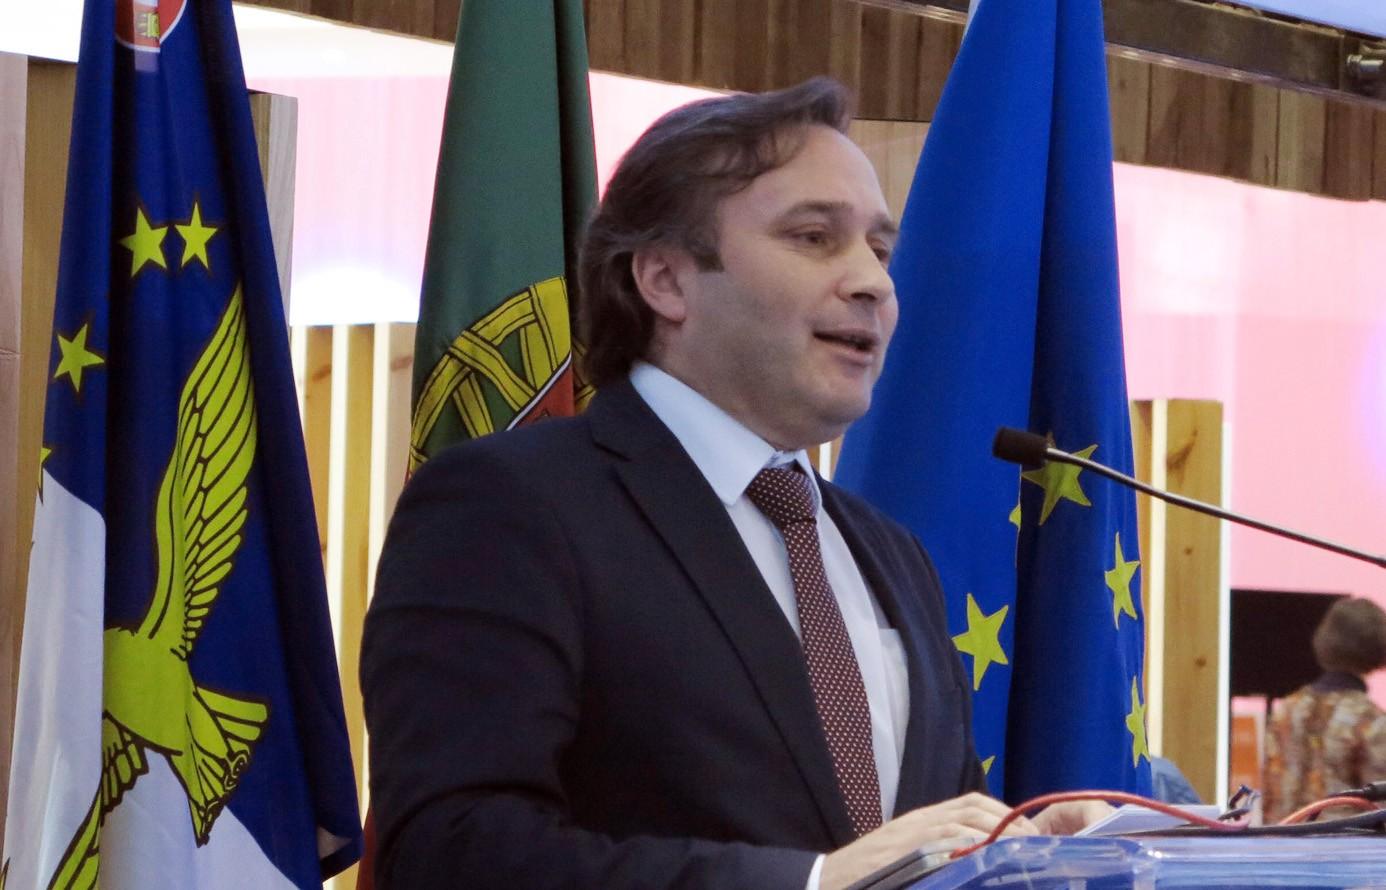 Protocolo com AHRESP potencia valor turístico da gastronomia regional, afirma Vítor Fraga